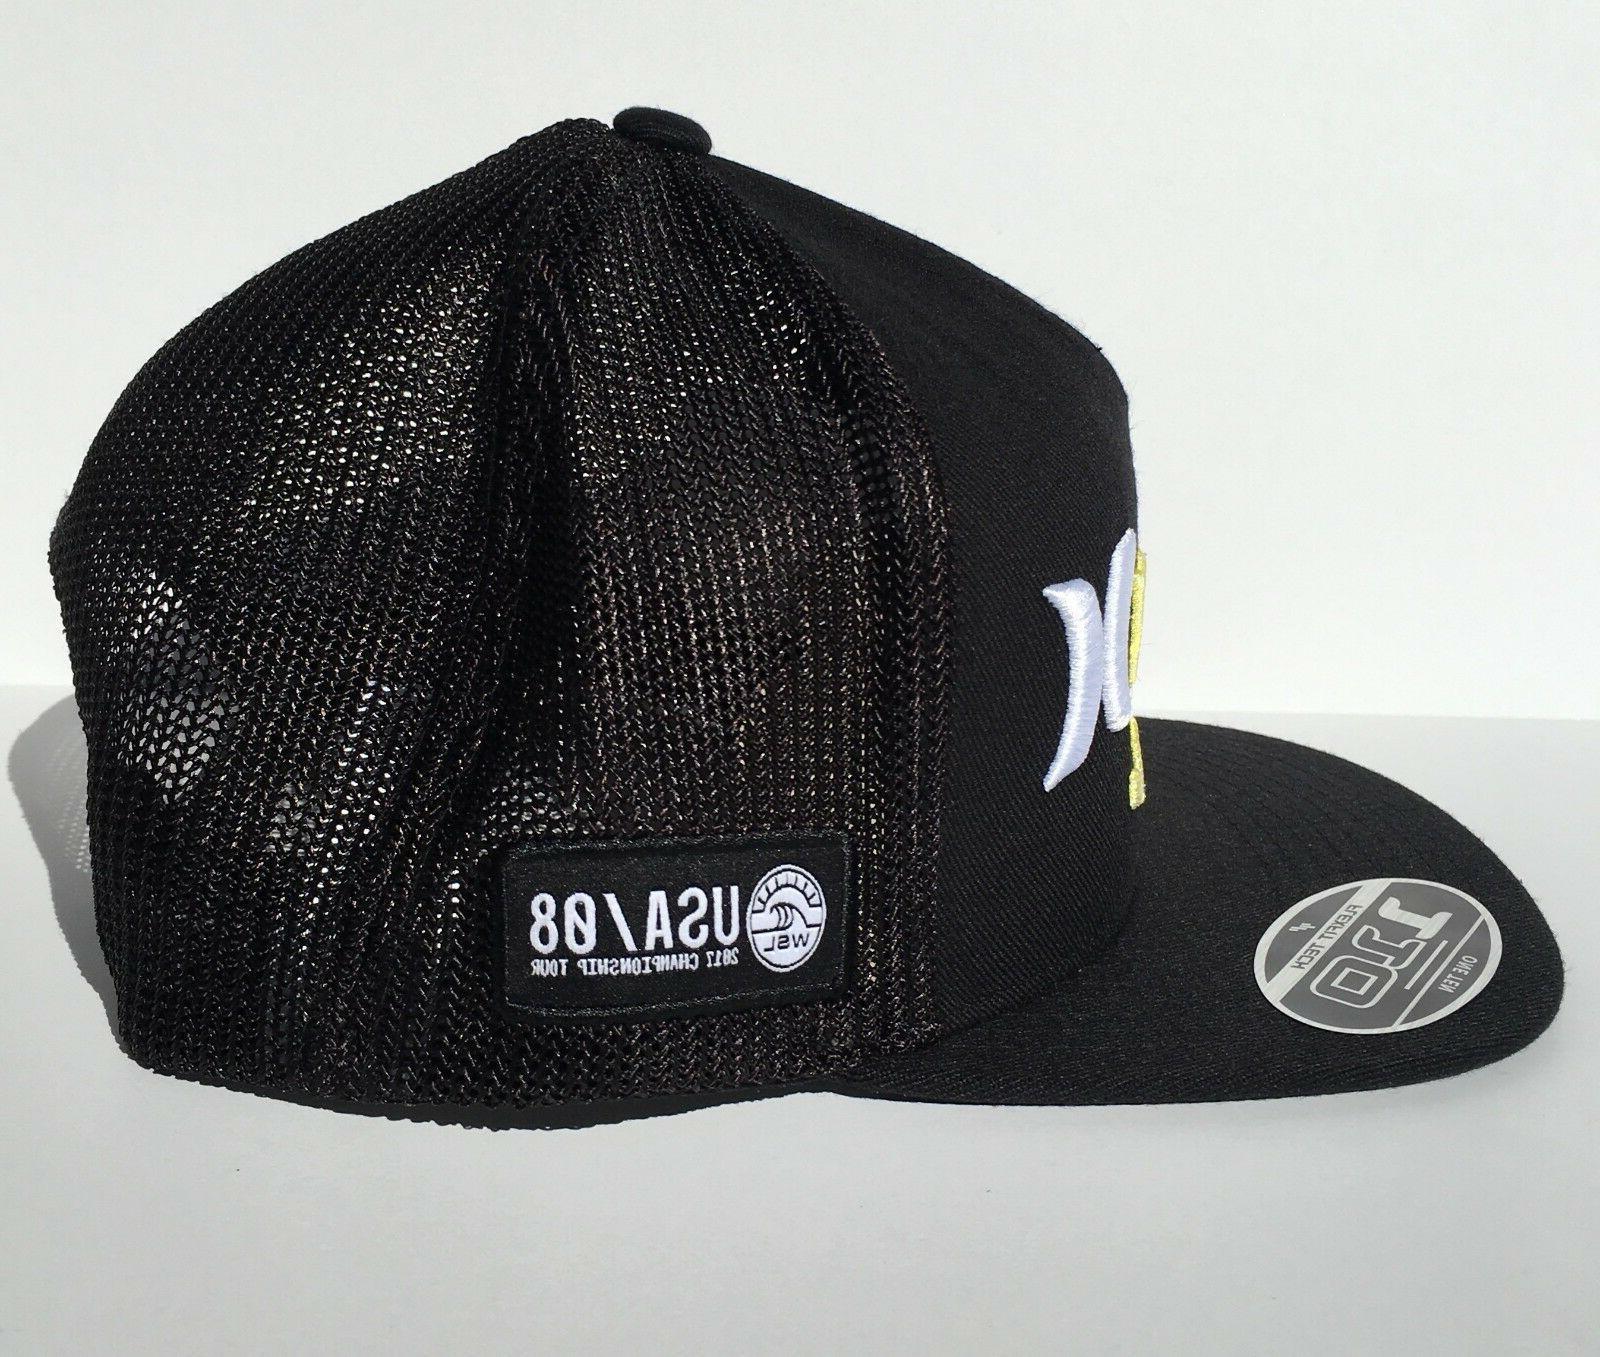 Hurley Championship Tour Hat JJF FlexFit